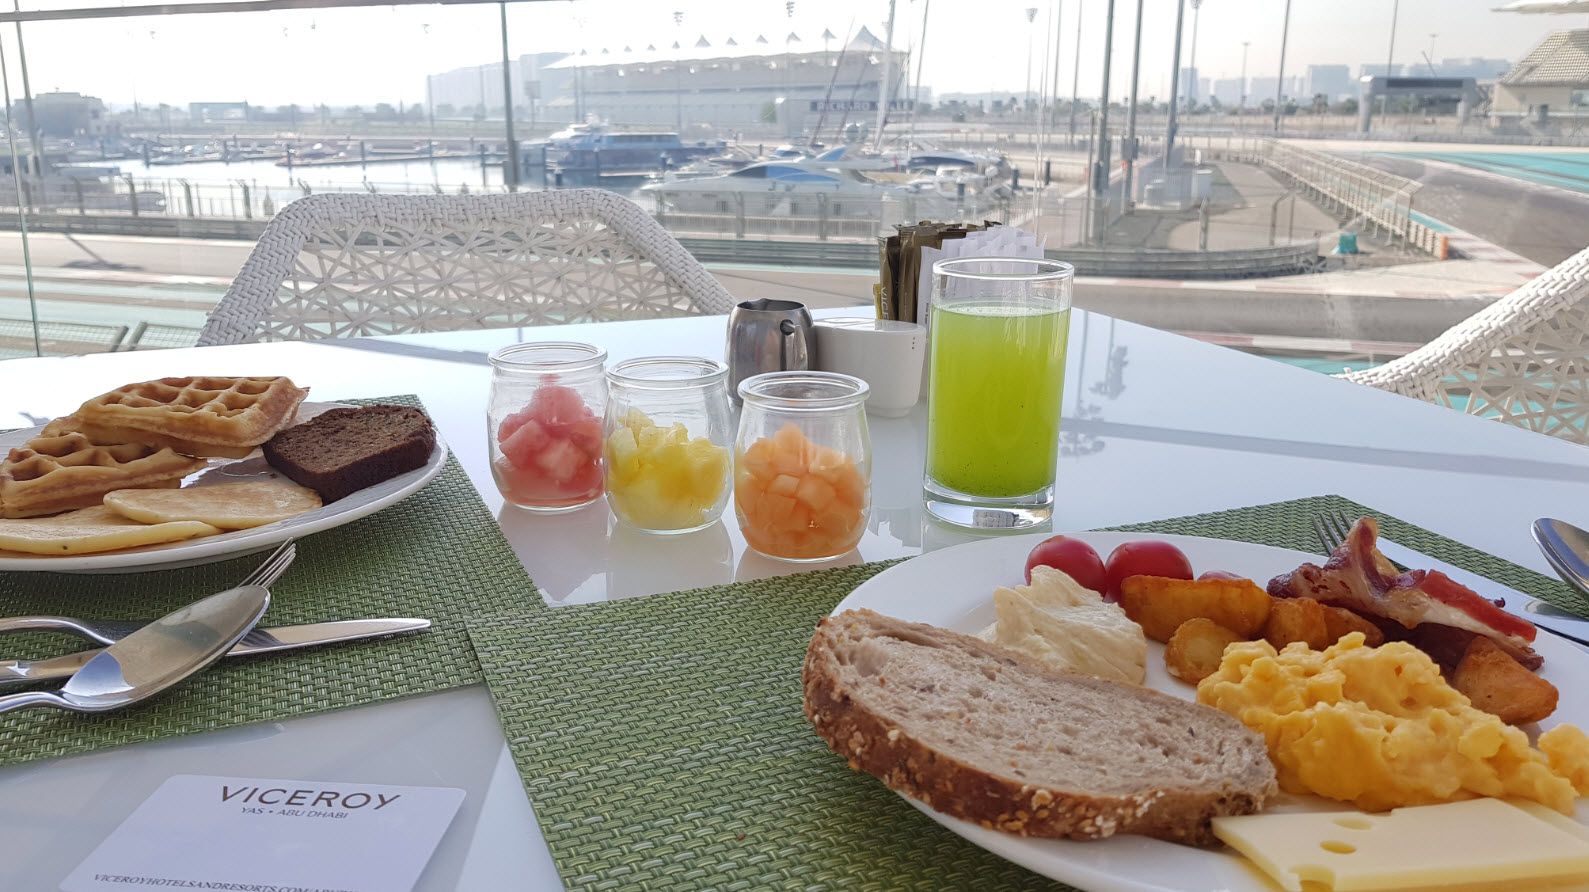 Breakfast circuit F1 view